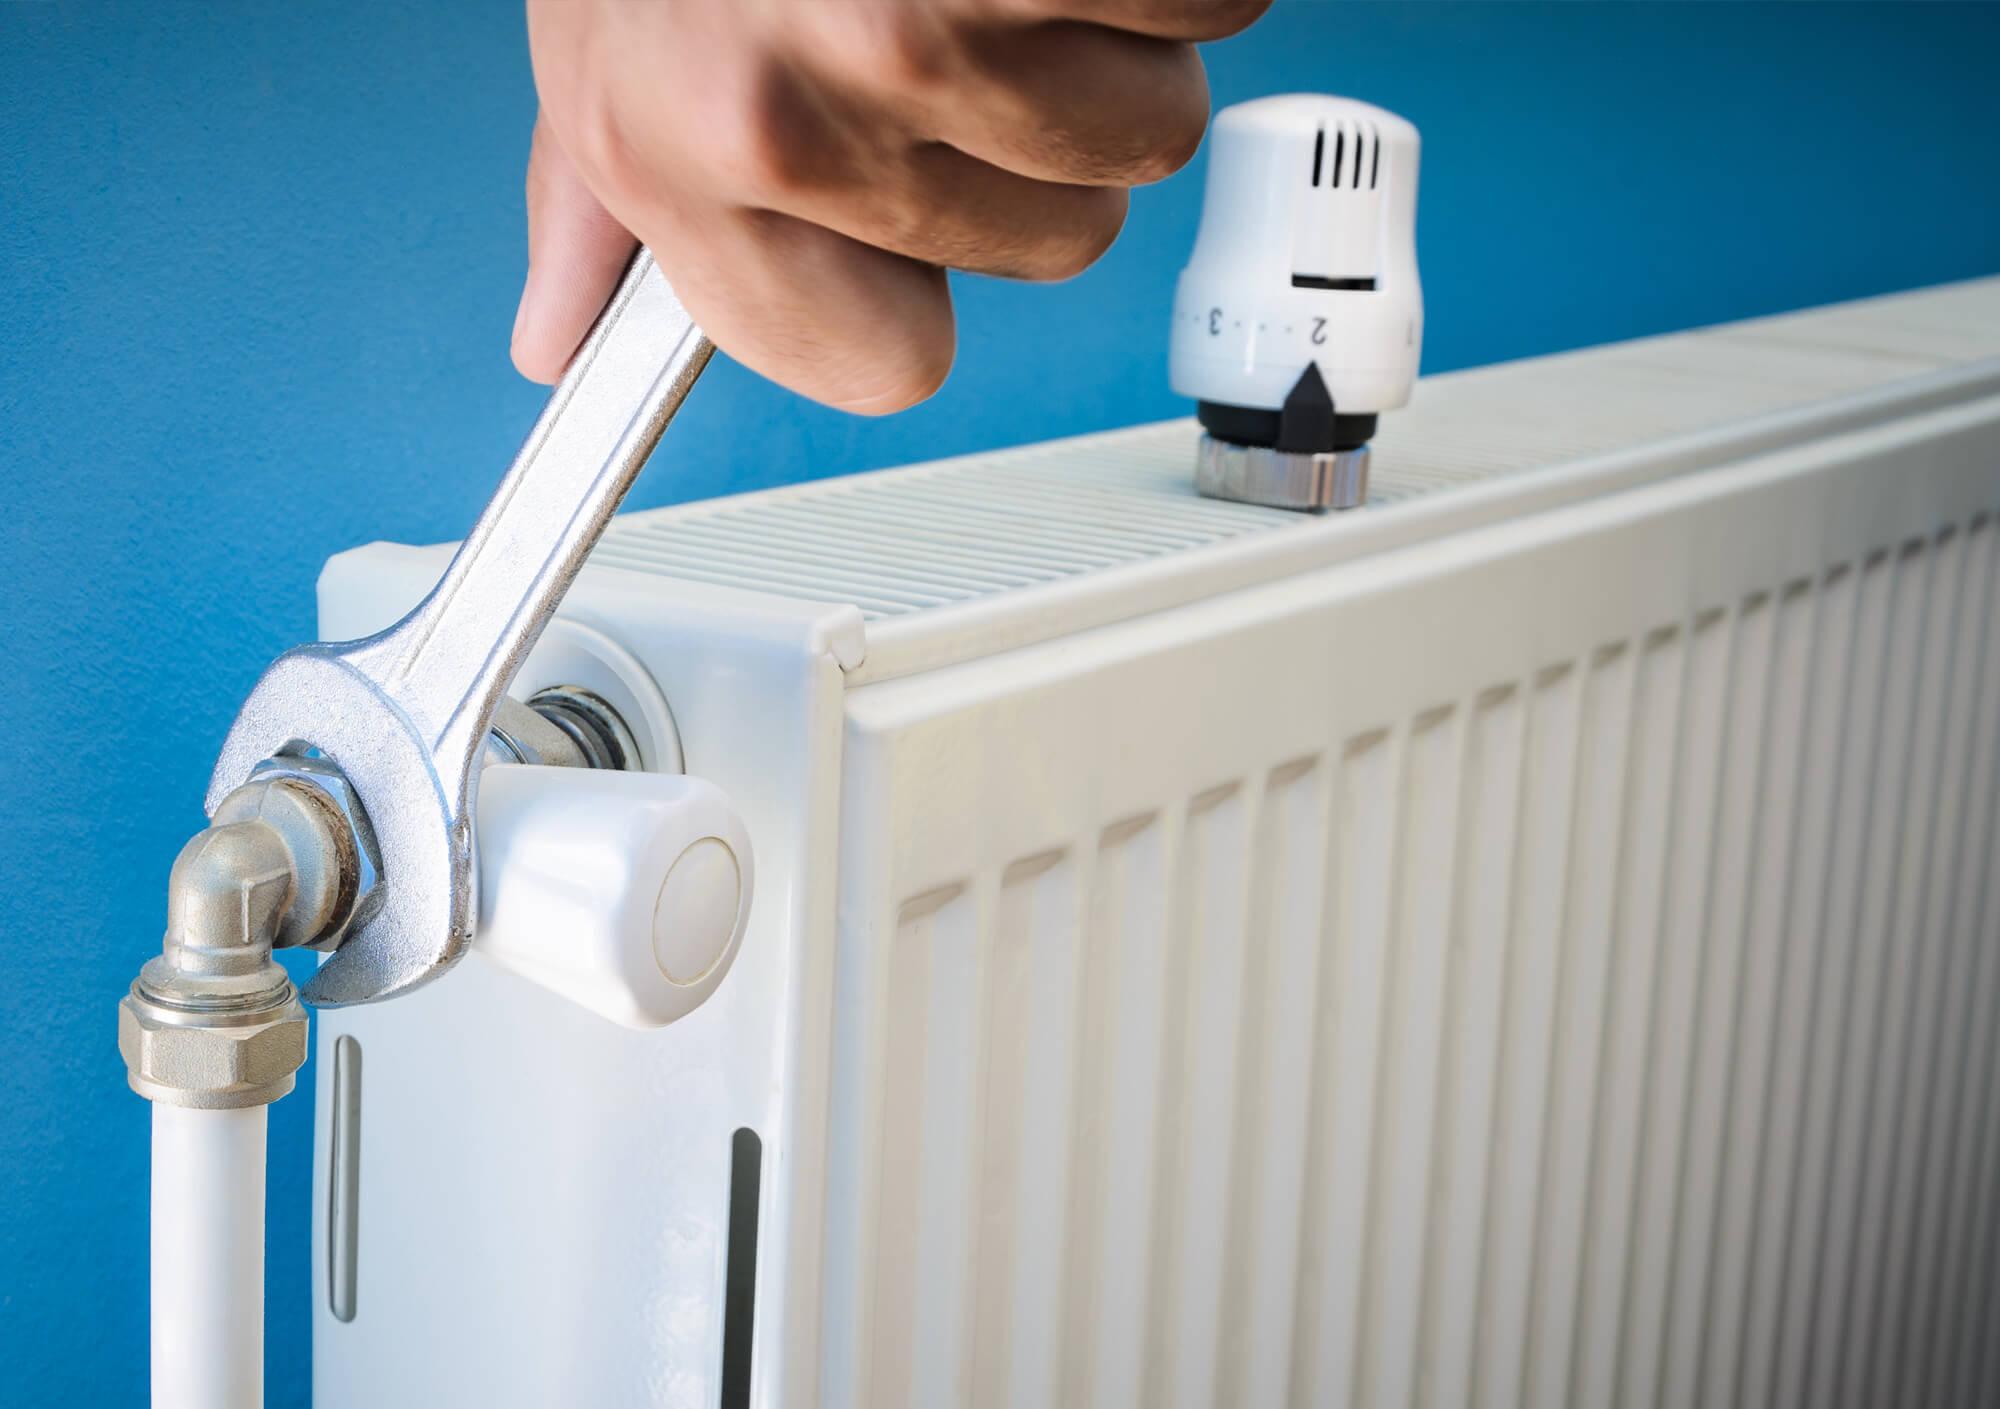 Fixing the radiator